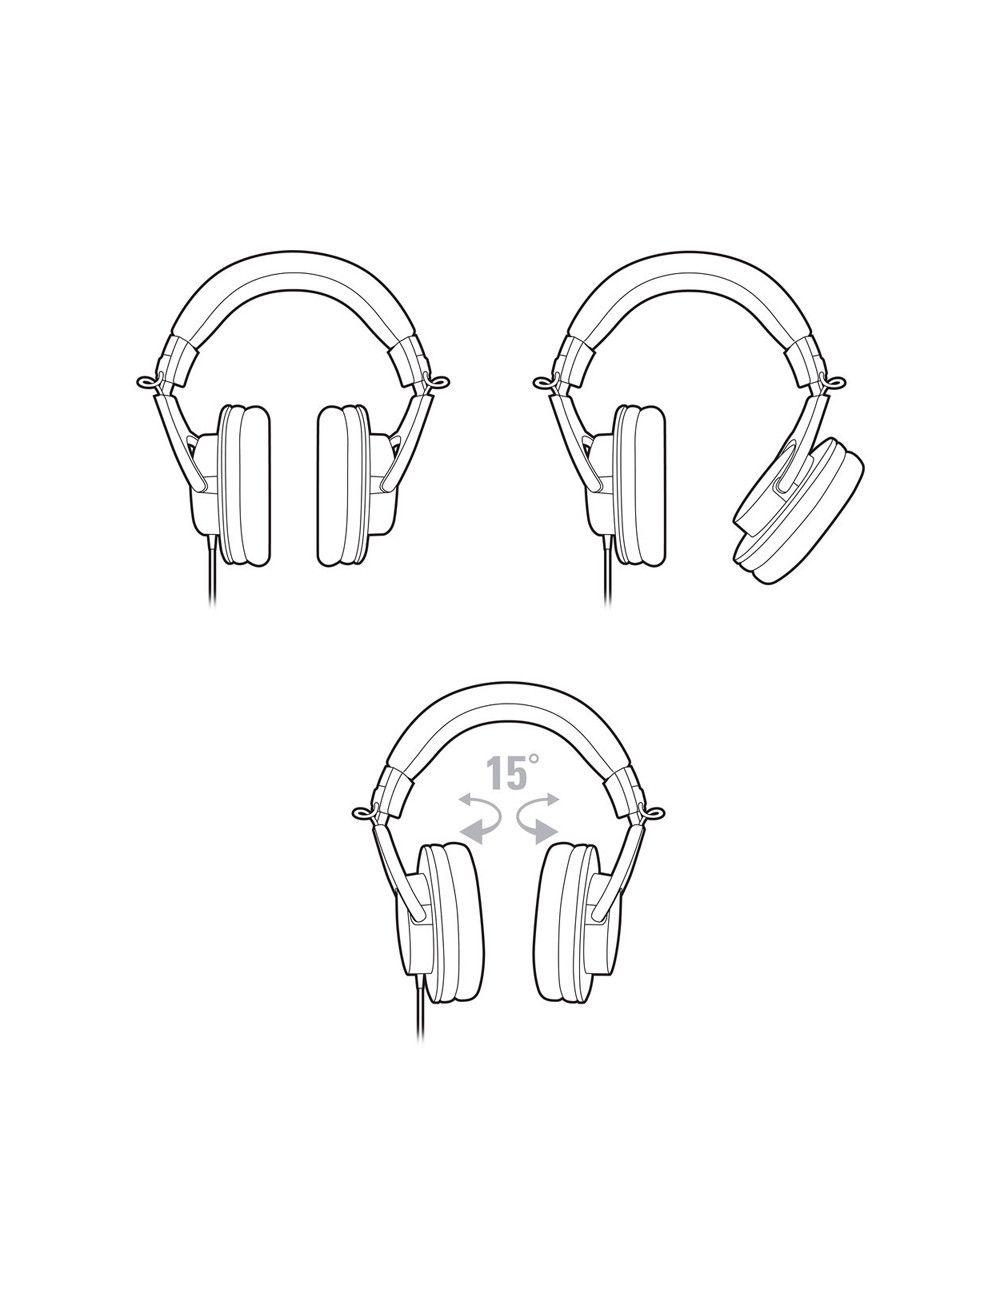 Rode SC6 Adaptador TRRS Para 2 micrófonos y 1 Audífono Para Smartphones